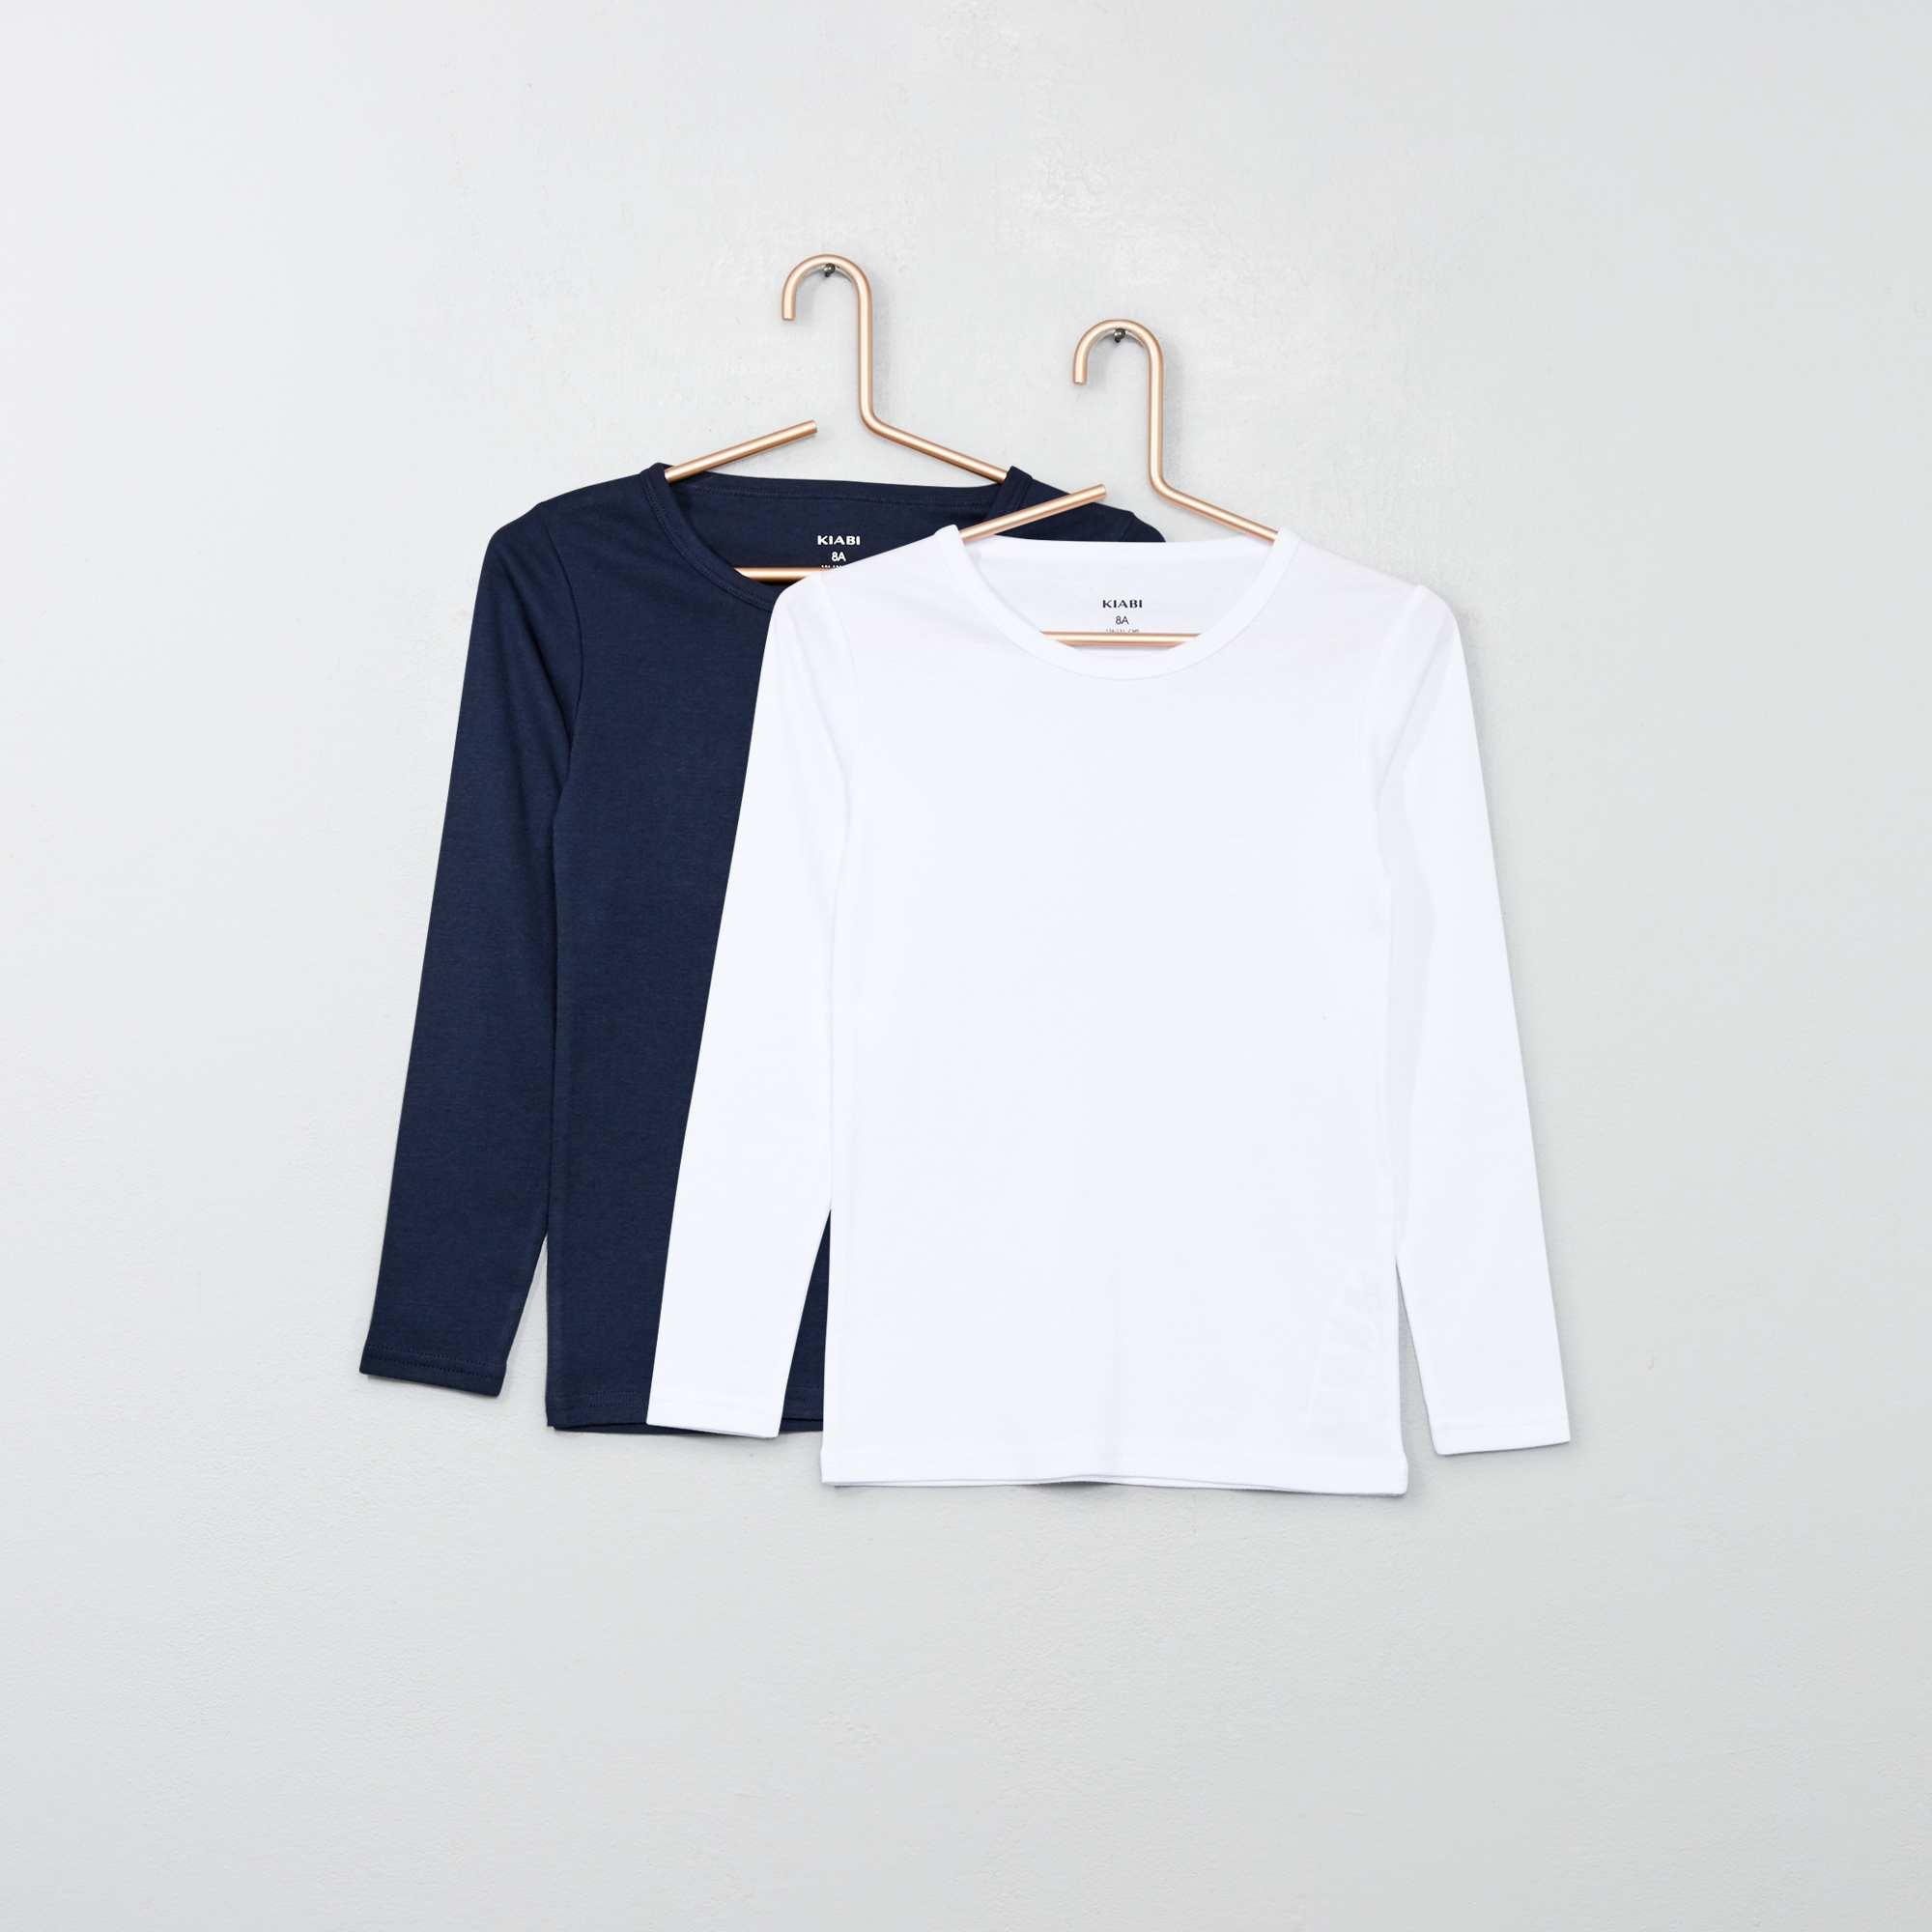 a8f1cb04ae2 Pack de 2 camisetas de manga larga azul marino blanco Chico. Loading zoom